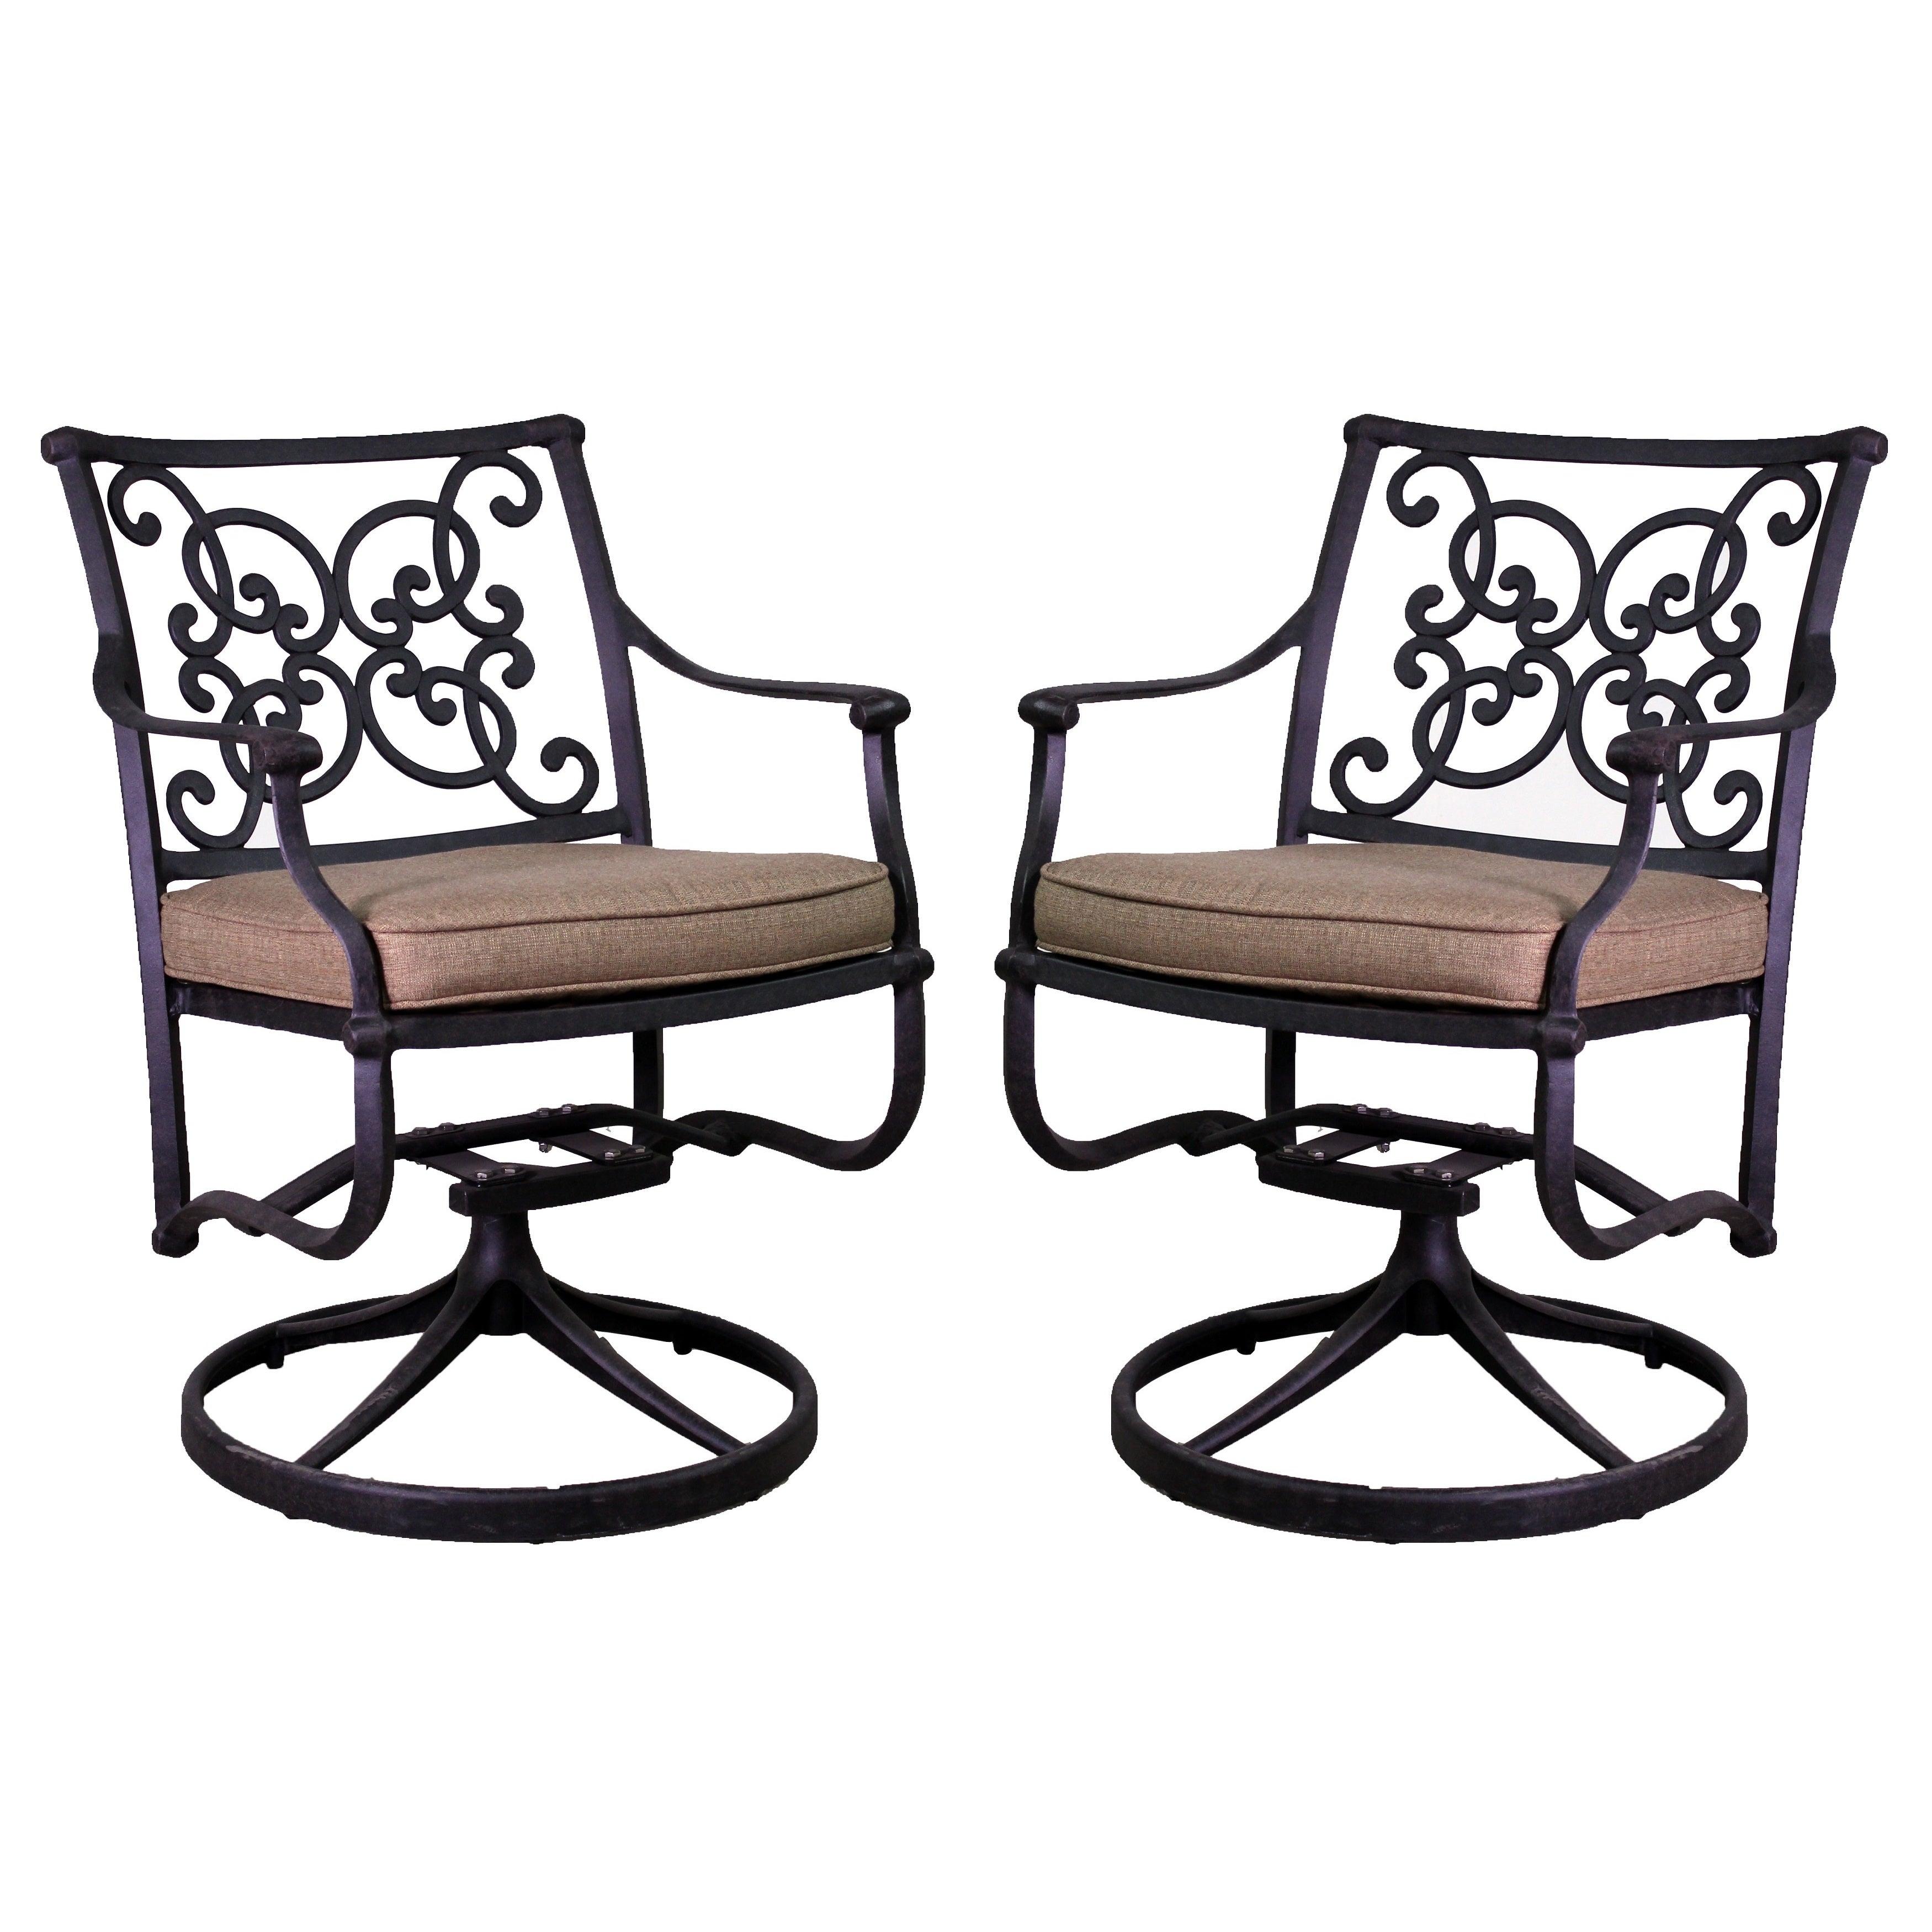 Azusa Black Aluminum Swivel Rocking Chair Set (Azusa Swiv...